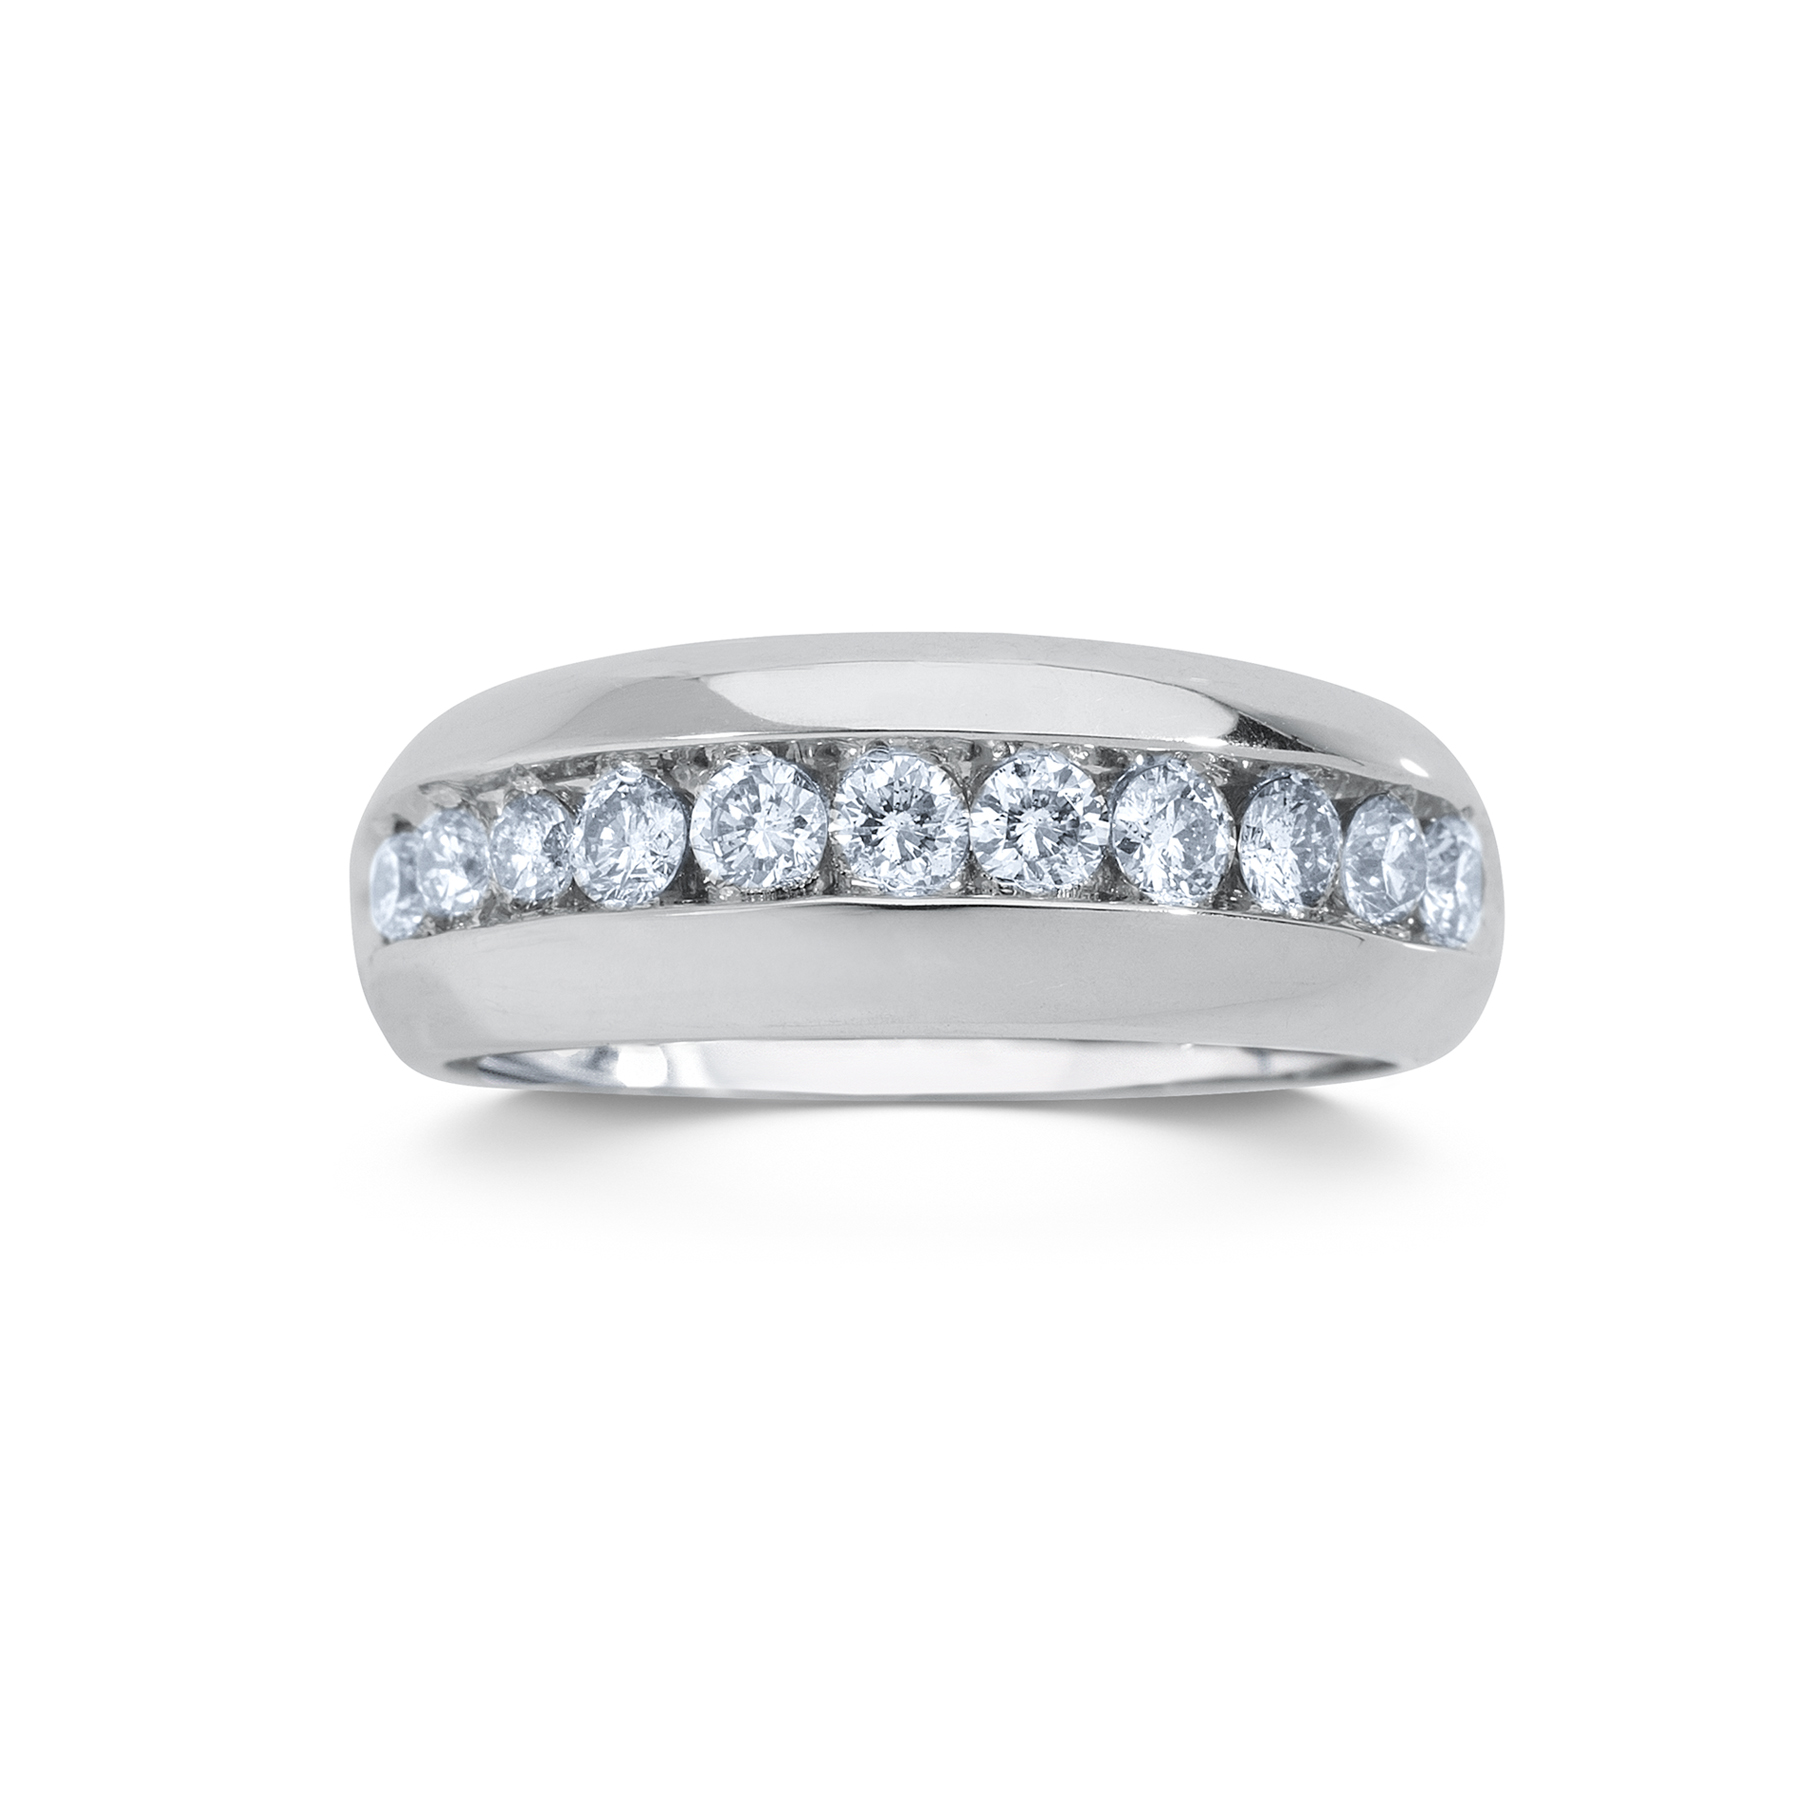 b Stone 20Type Diamond&filterList Stone 20Type sears wedding bands Wedding Bands